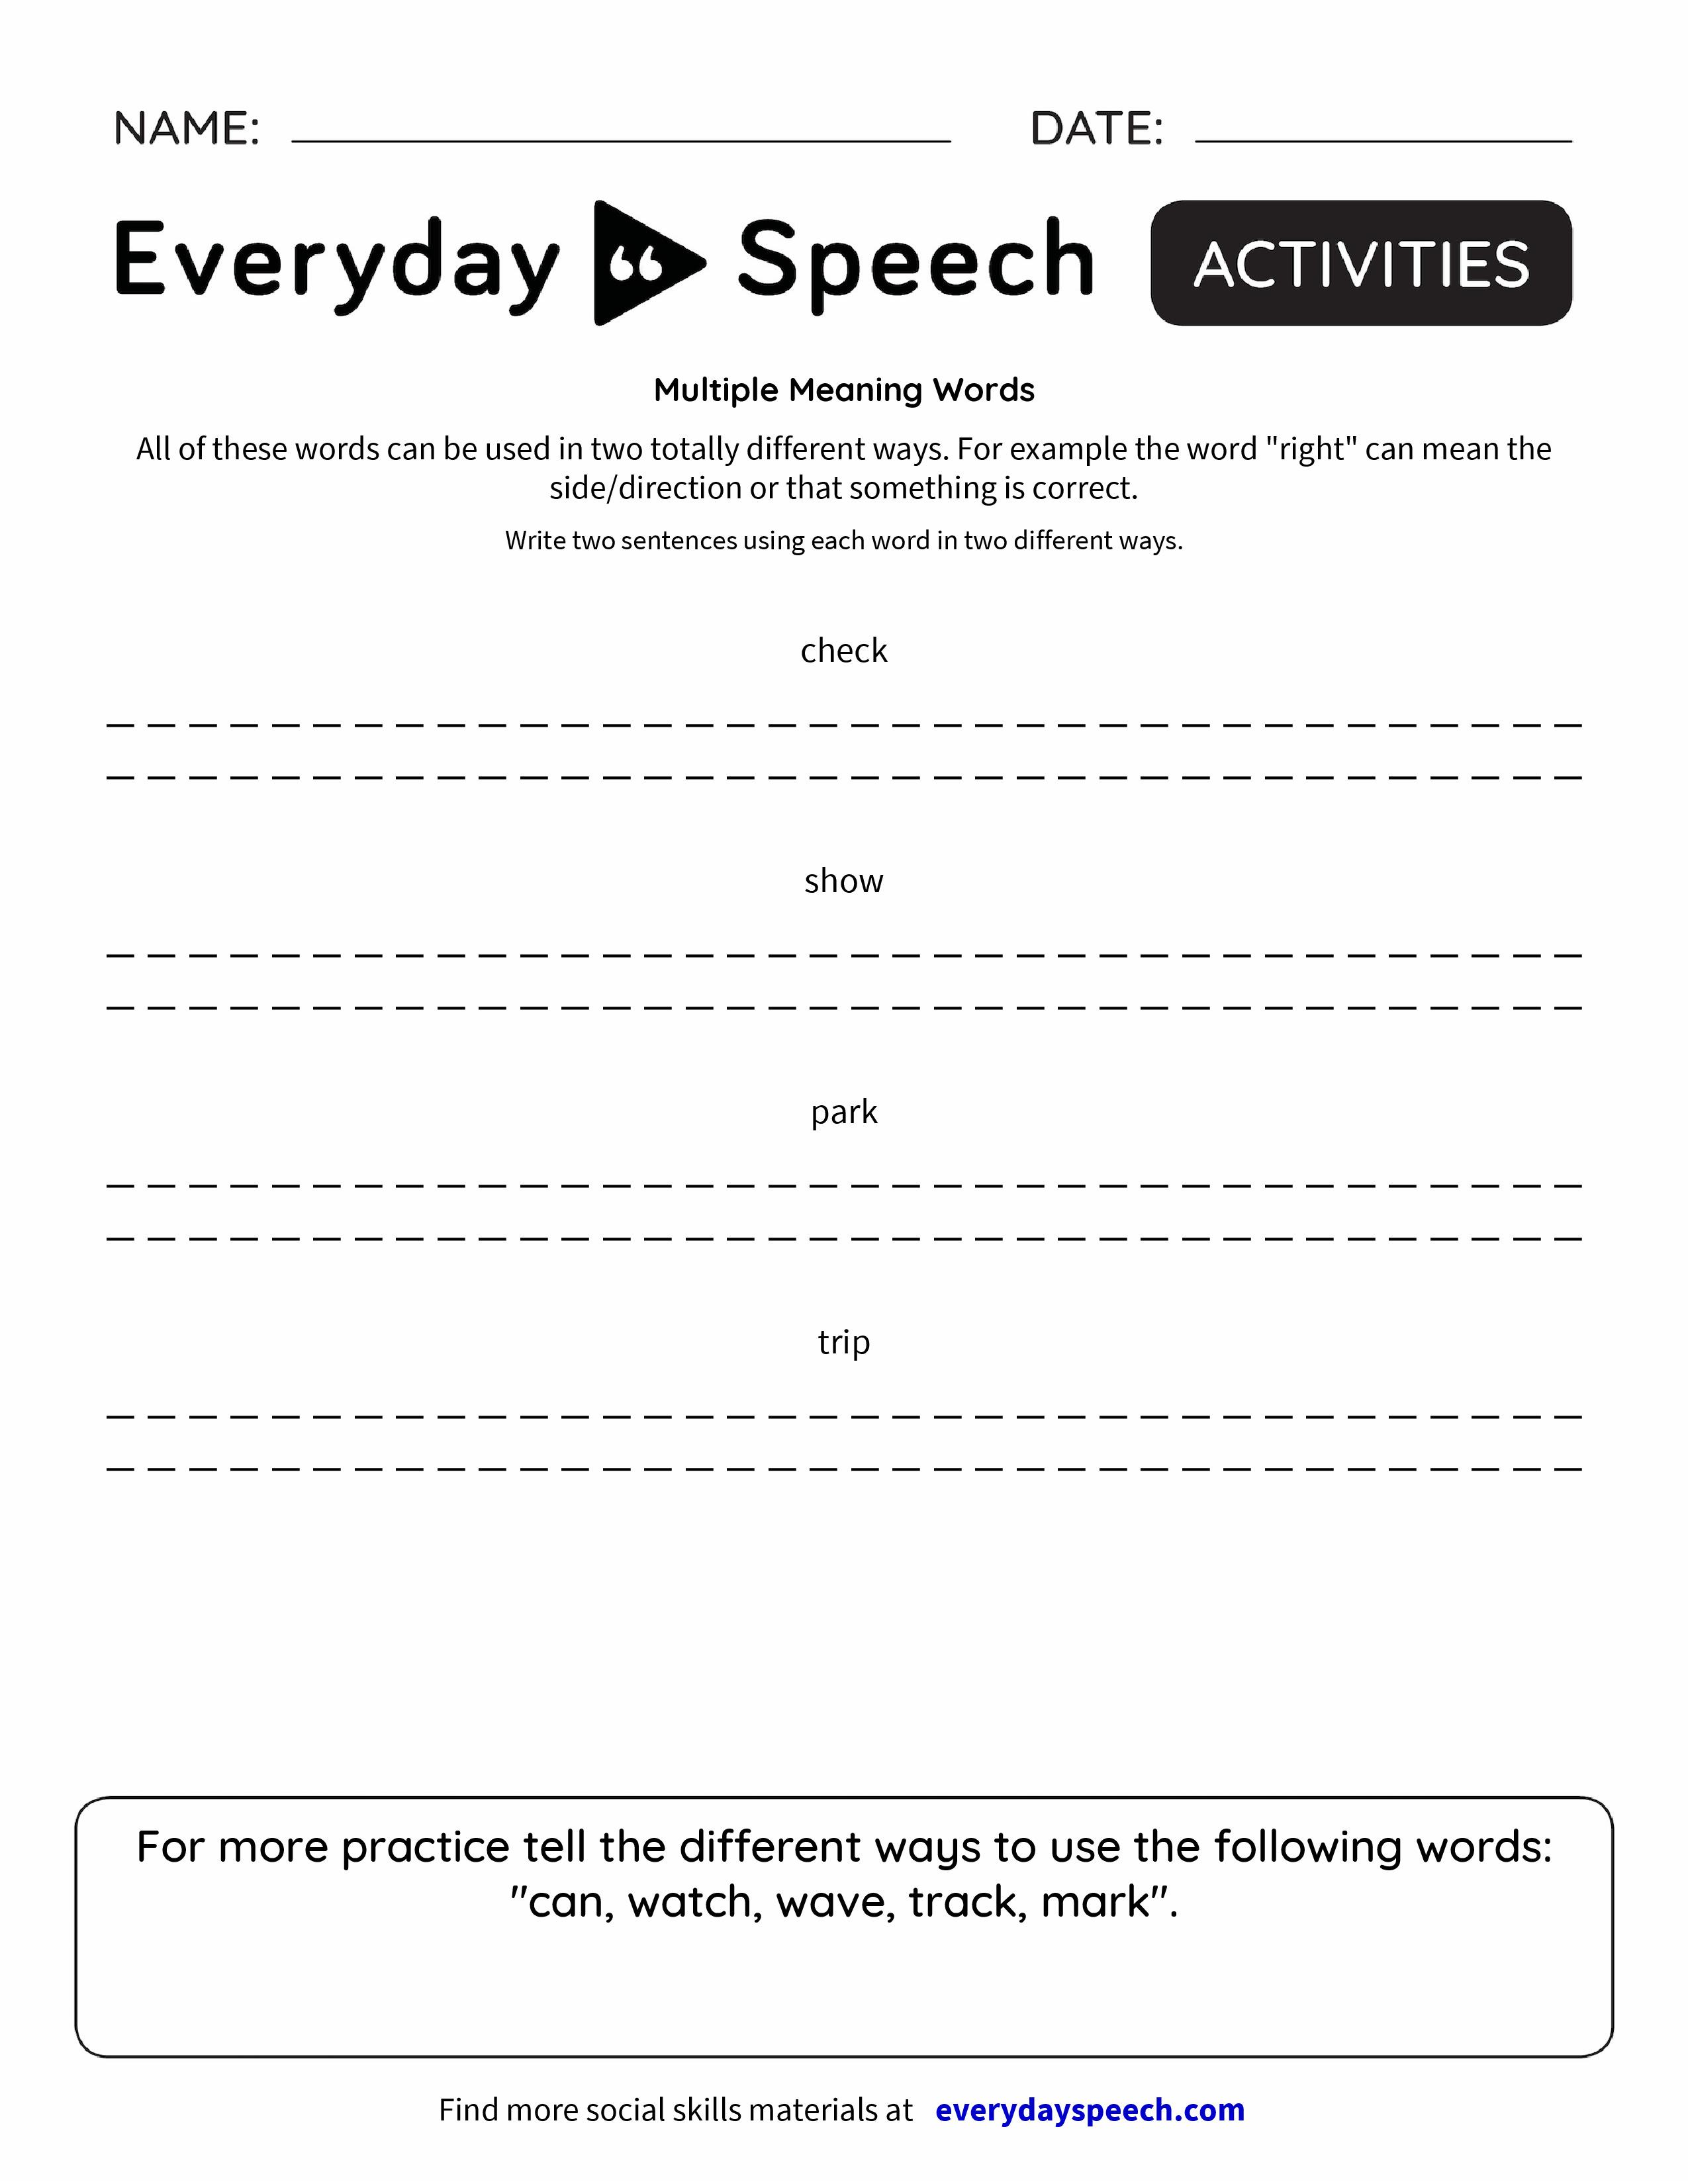 Worksheets Multiple Meaning Words Worksheet multiple meaning words everyday speech words